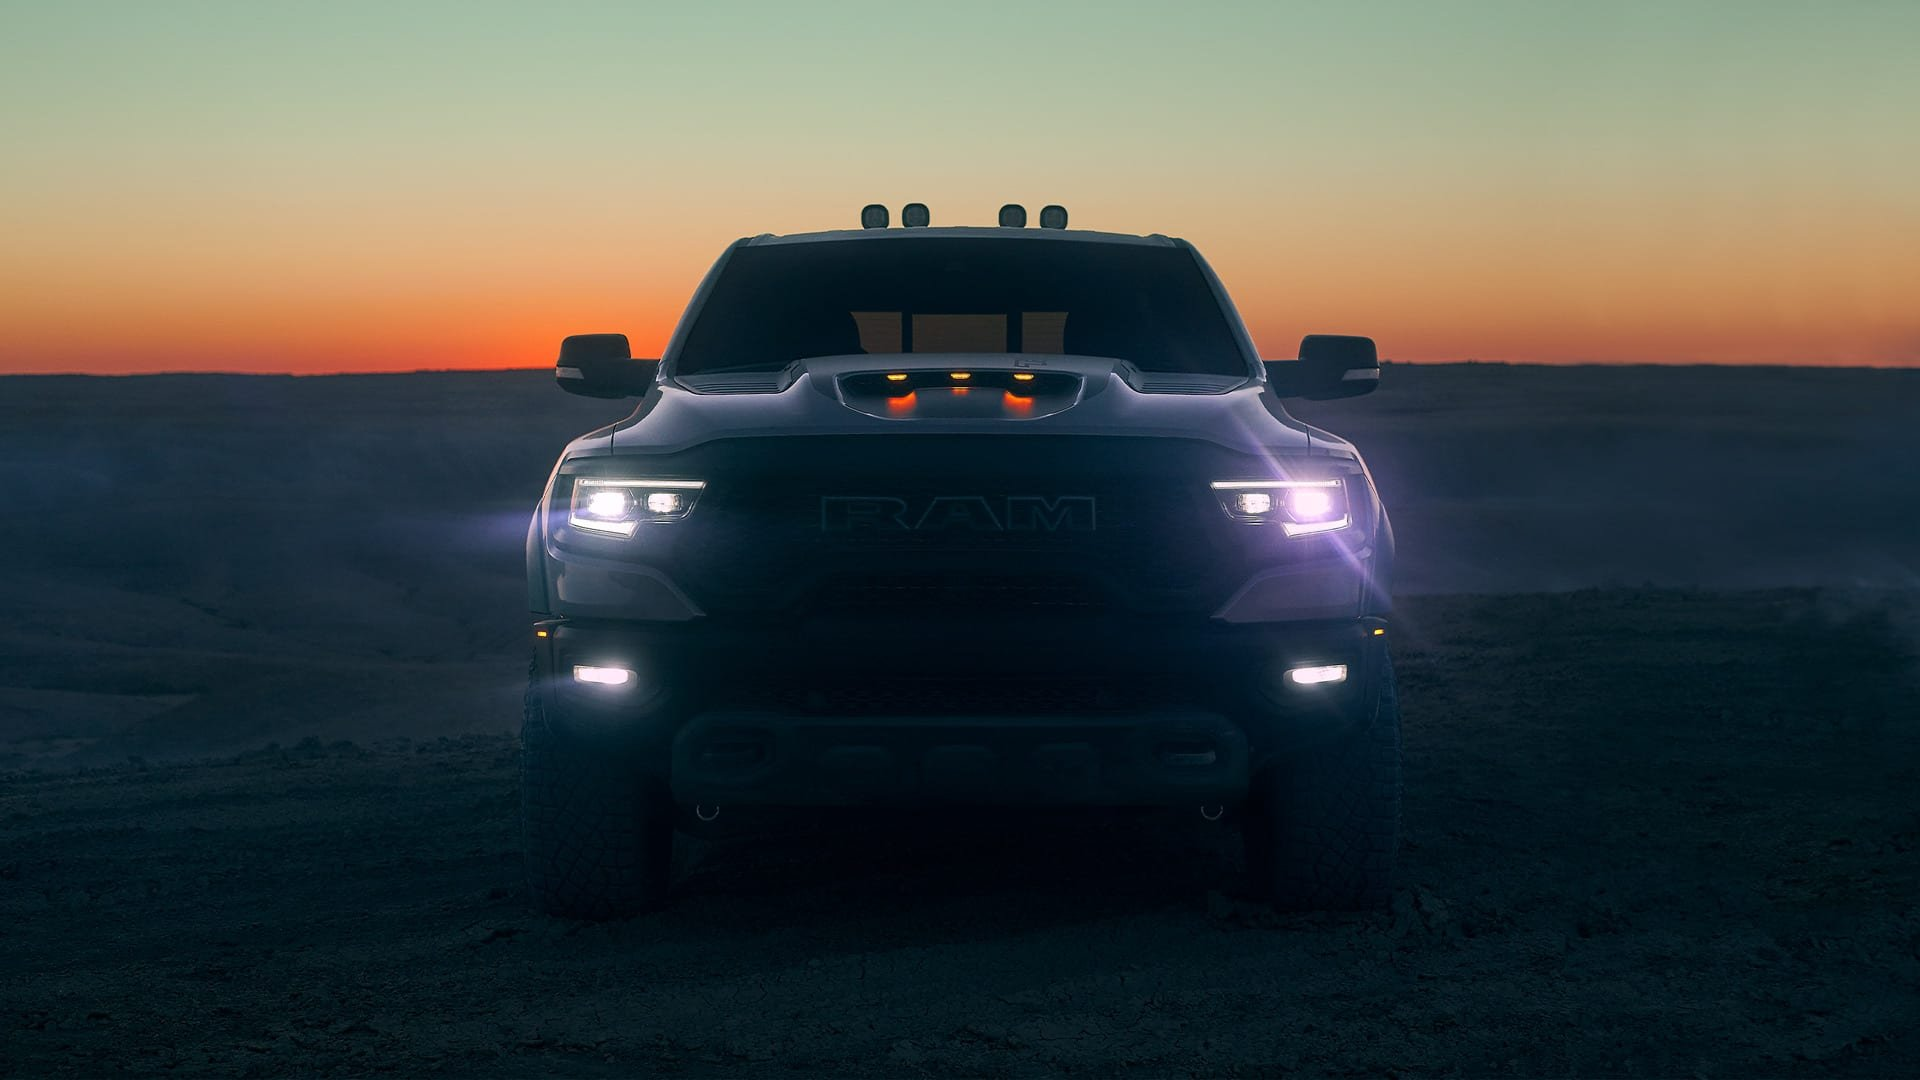 New 2021 Ram 1500 TRX Coming Soon